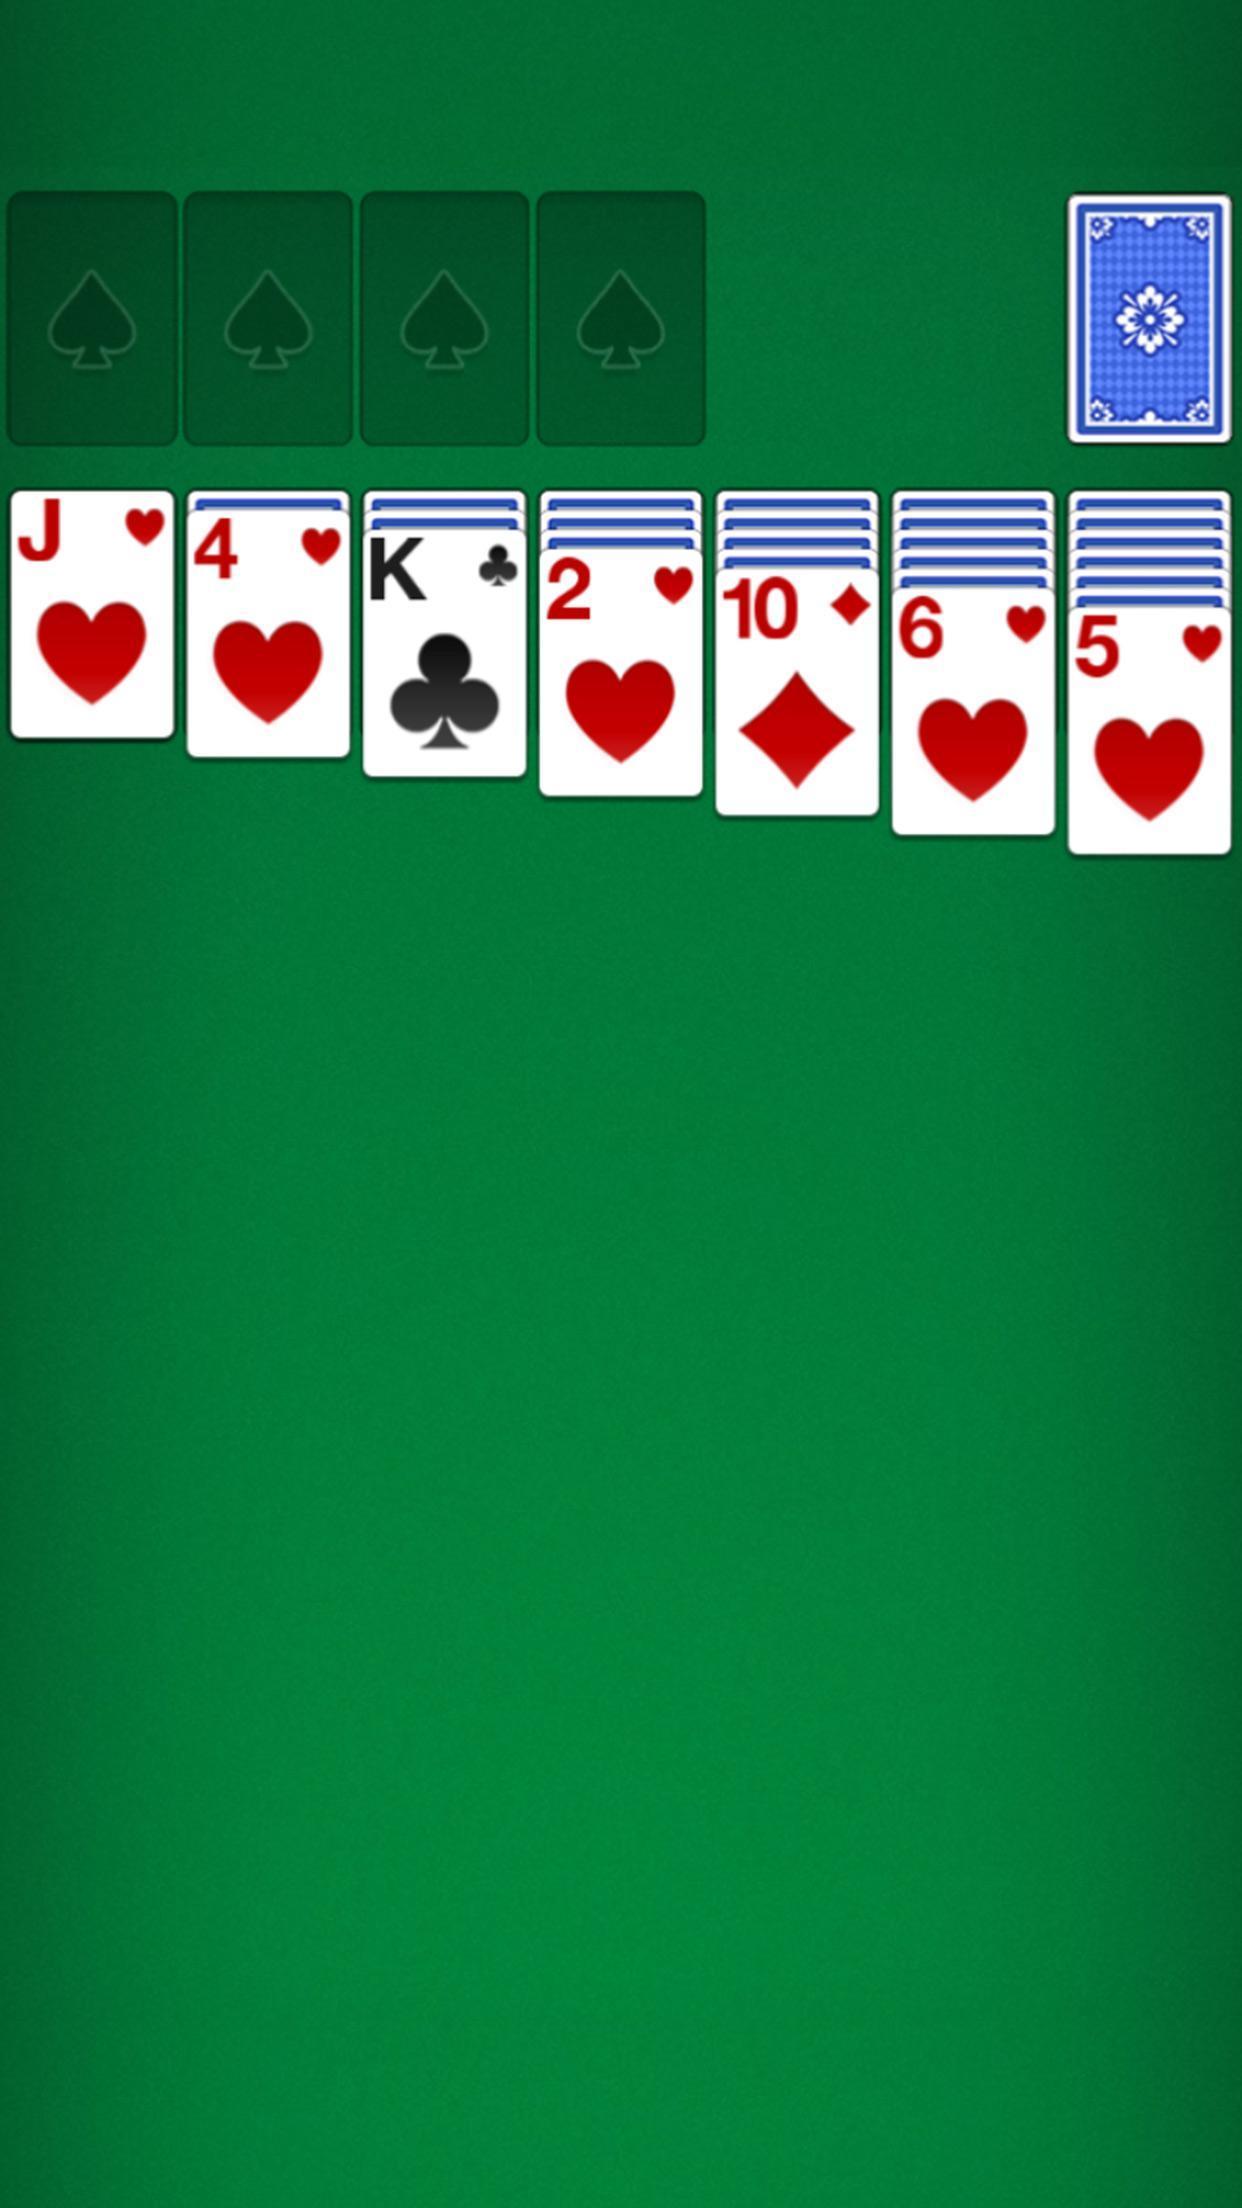 Древнейшая азартная игра